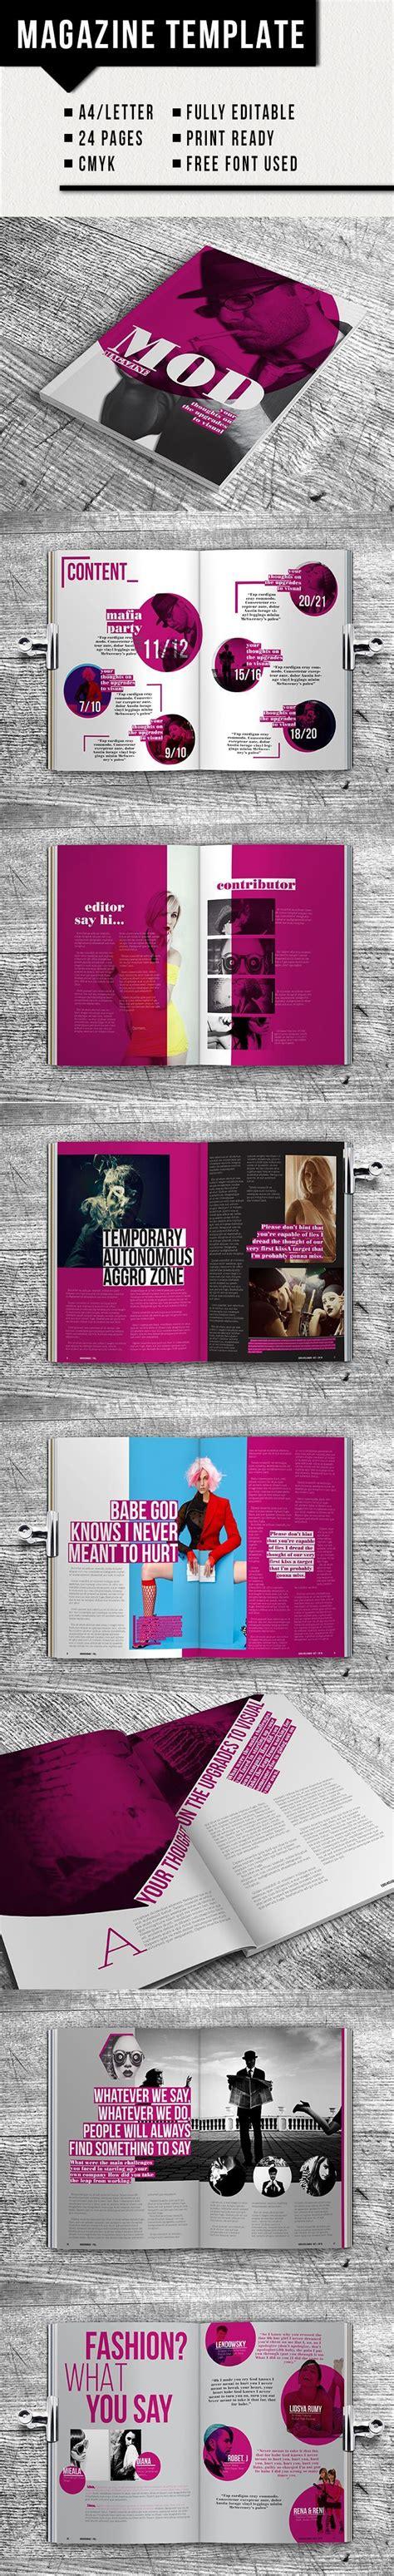 magazine layout internships style inspiration internship report stageverslag